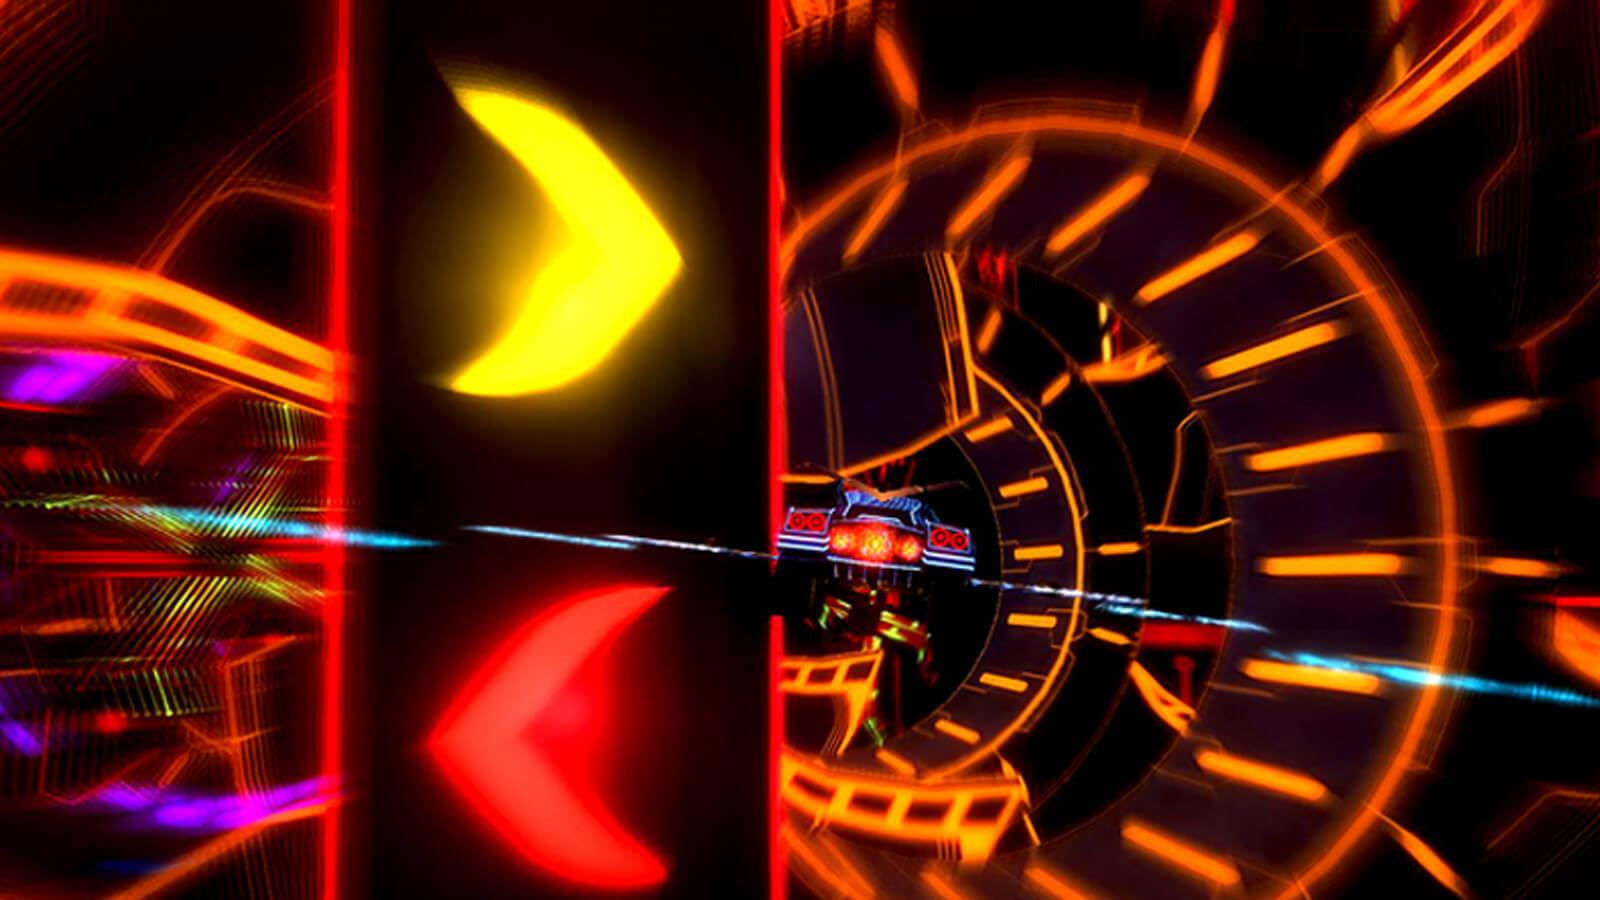 A car speeds through a massive neon-lit tunnel.